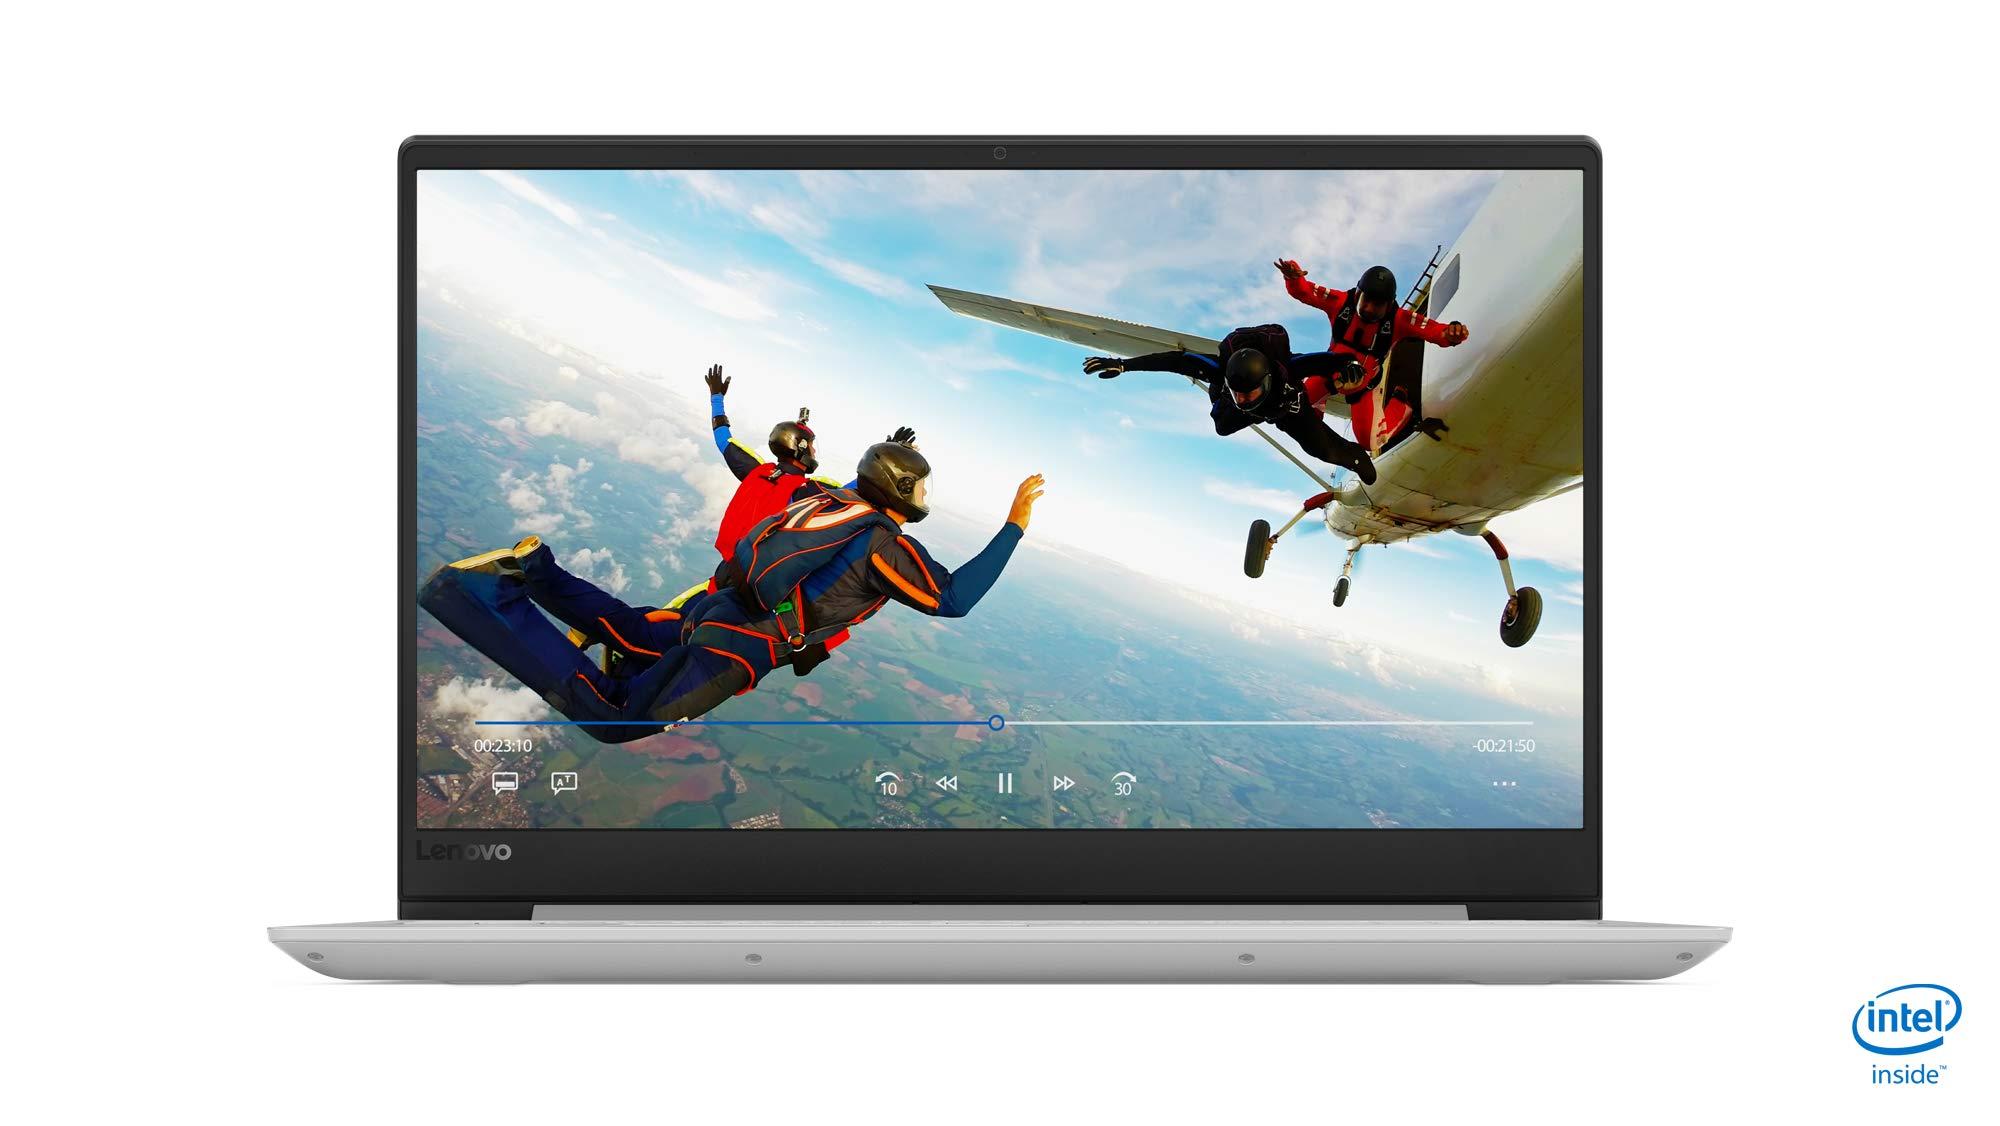 "2018 Lenovo Ideapad 330S 15.6"" Laptop, Windows 10, Intel Core i5-8250U Quad-Core Processor, 20GB (4GB + 16GB Intel Optane) Memory, 1TB Hard Drive - Platinum Grey"